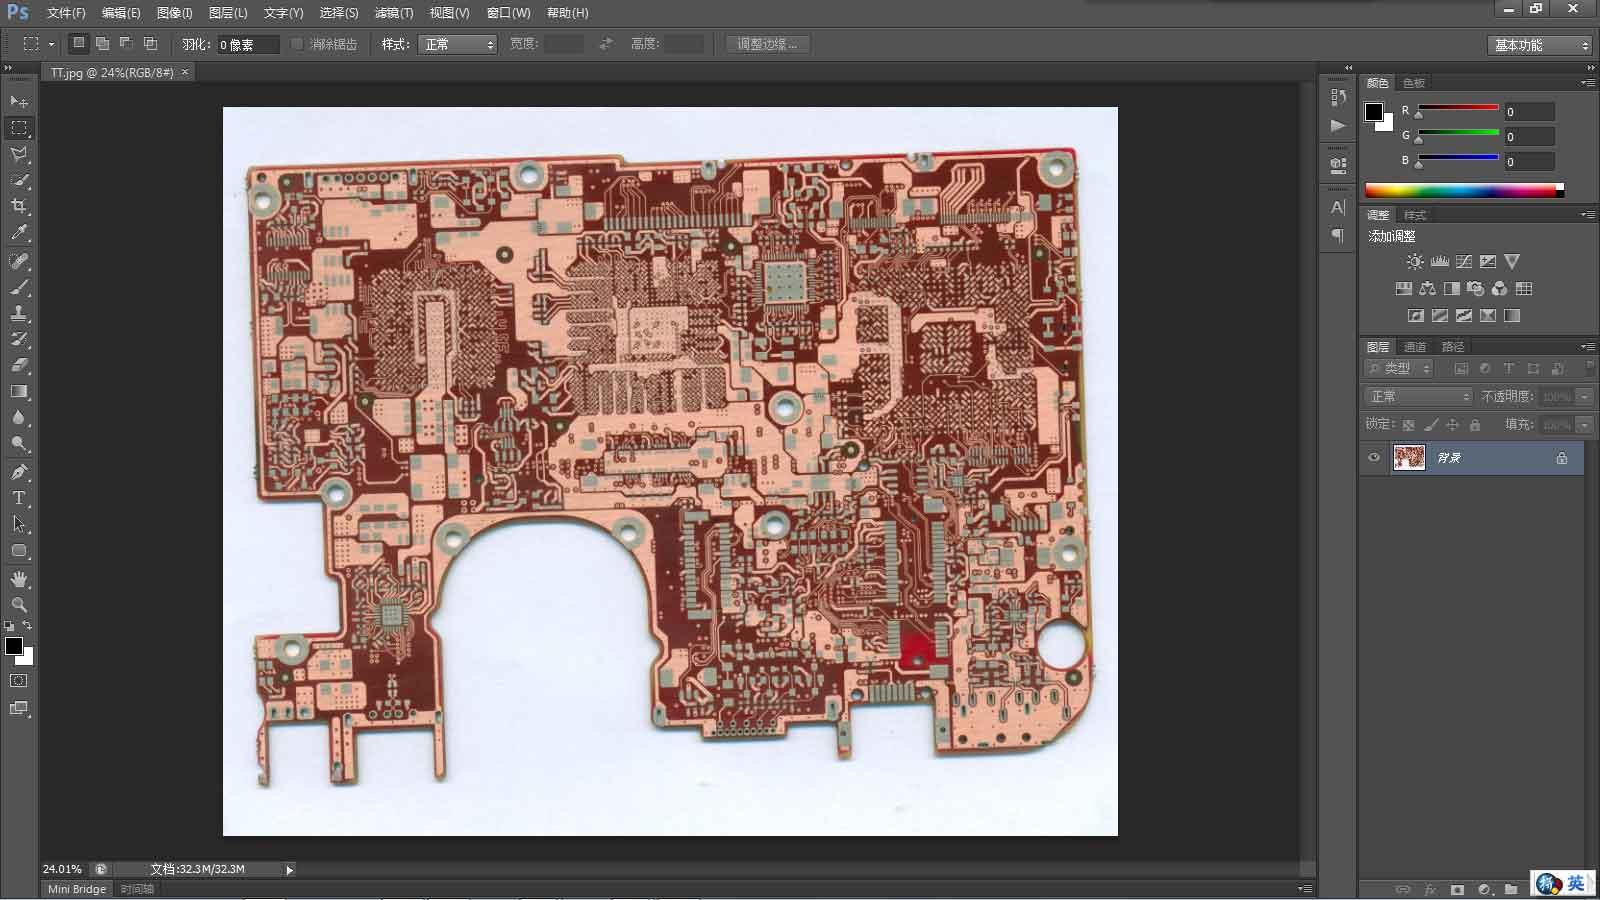 PCB抄板图片处理步骤图解1